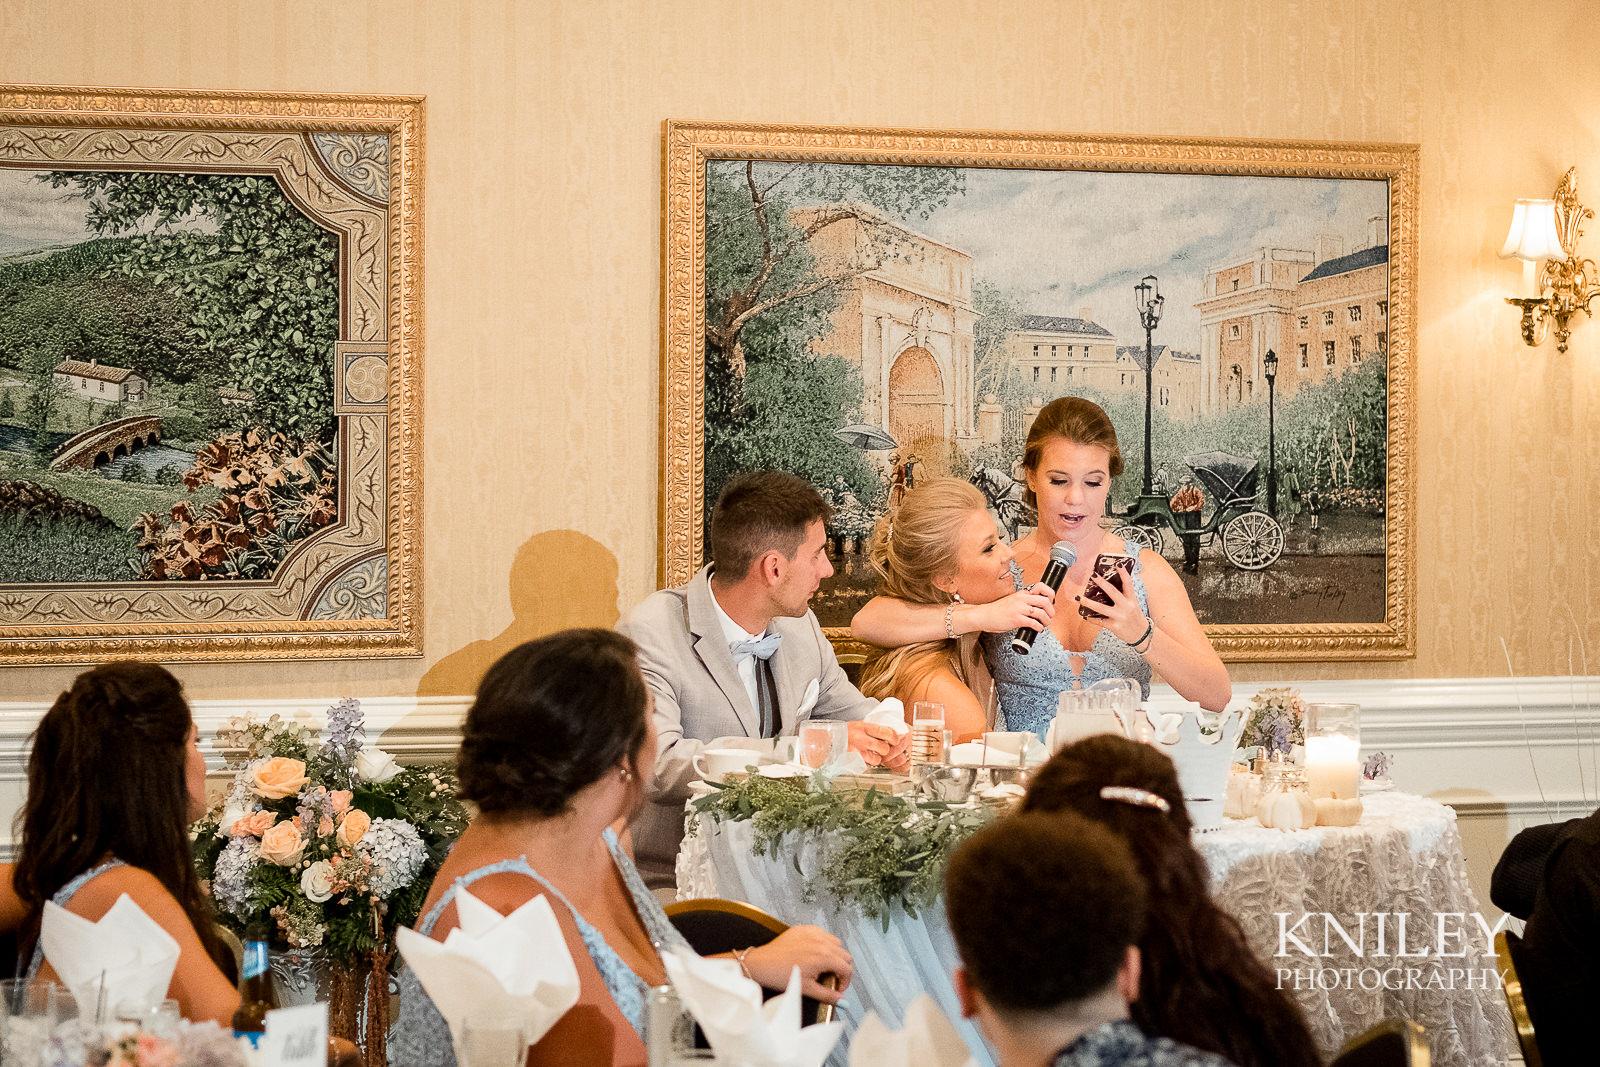 096 - Buffalo NY wedding pictures - Sean Patrick Restaurant Wedding Reception - Getzville - XT2B9440.jpg